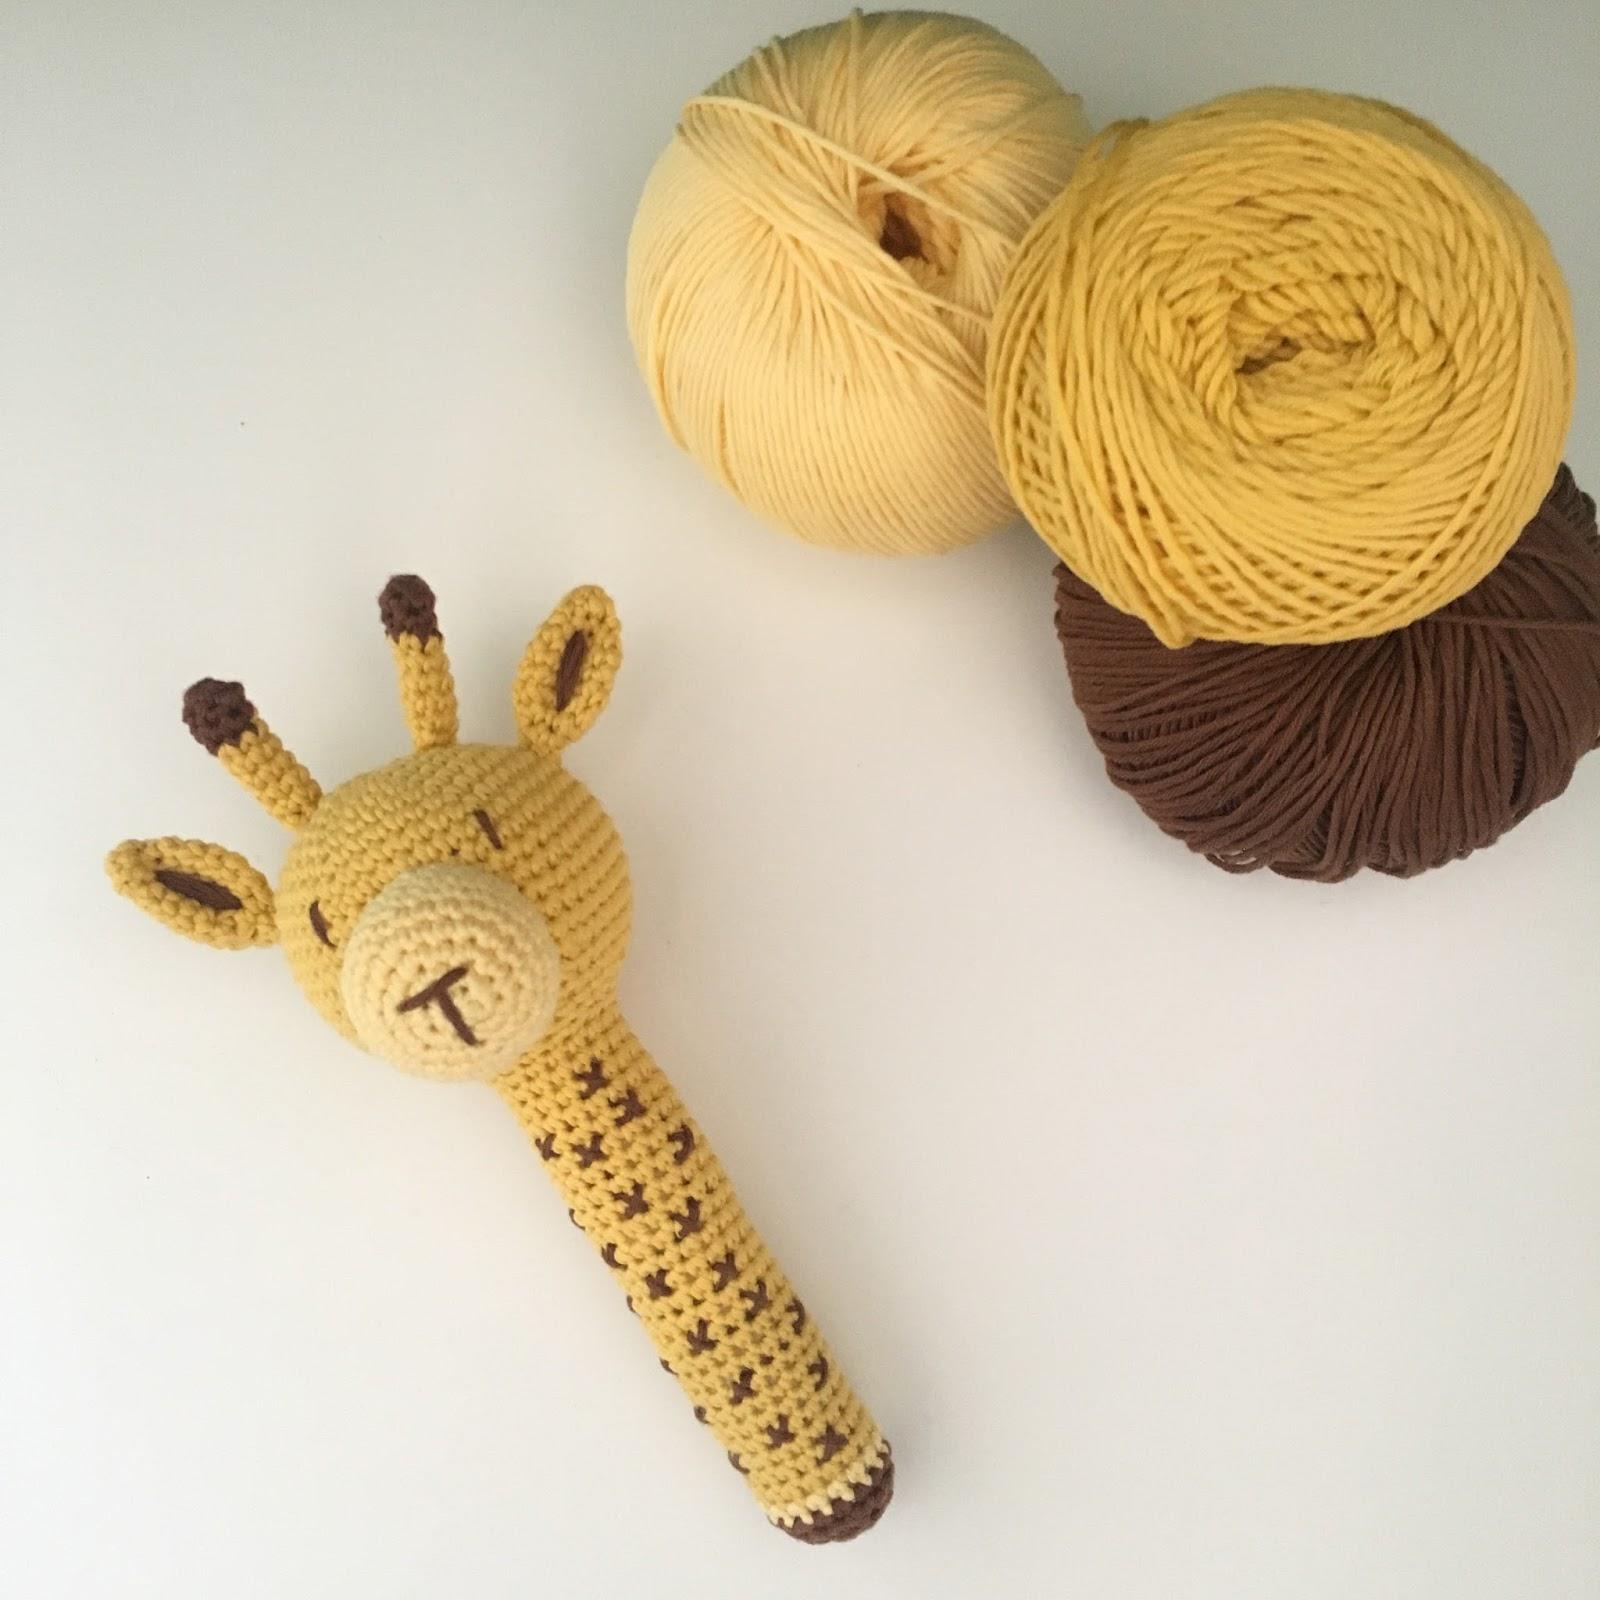 Crochet plush toy giraffe en 2020 | Amigurumi patrones gratis ... | 1600x1600